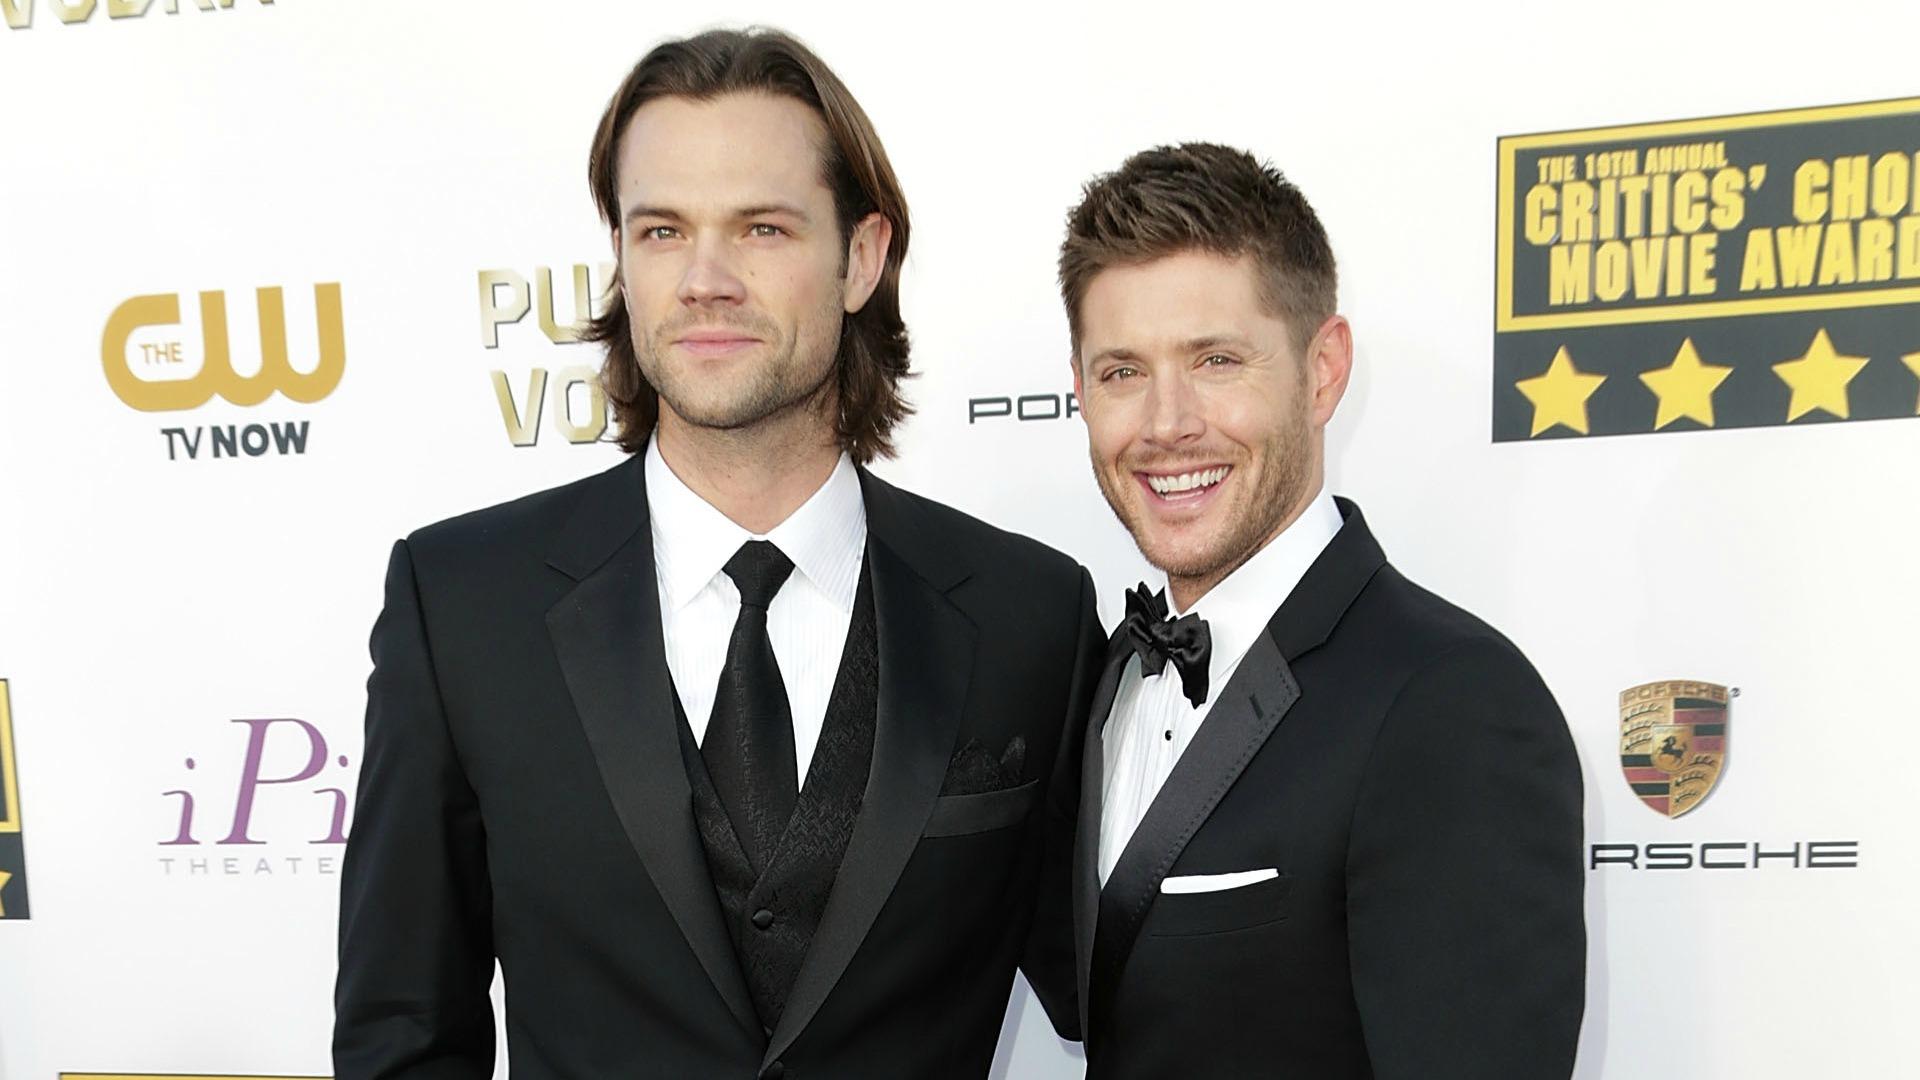 Jared Paladecki and Jensen Ackles